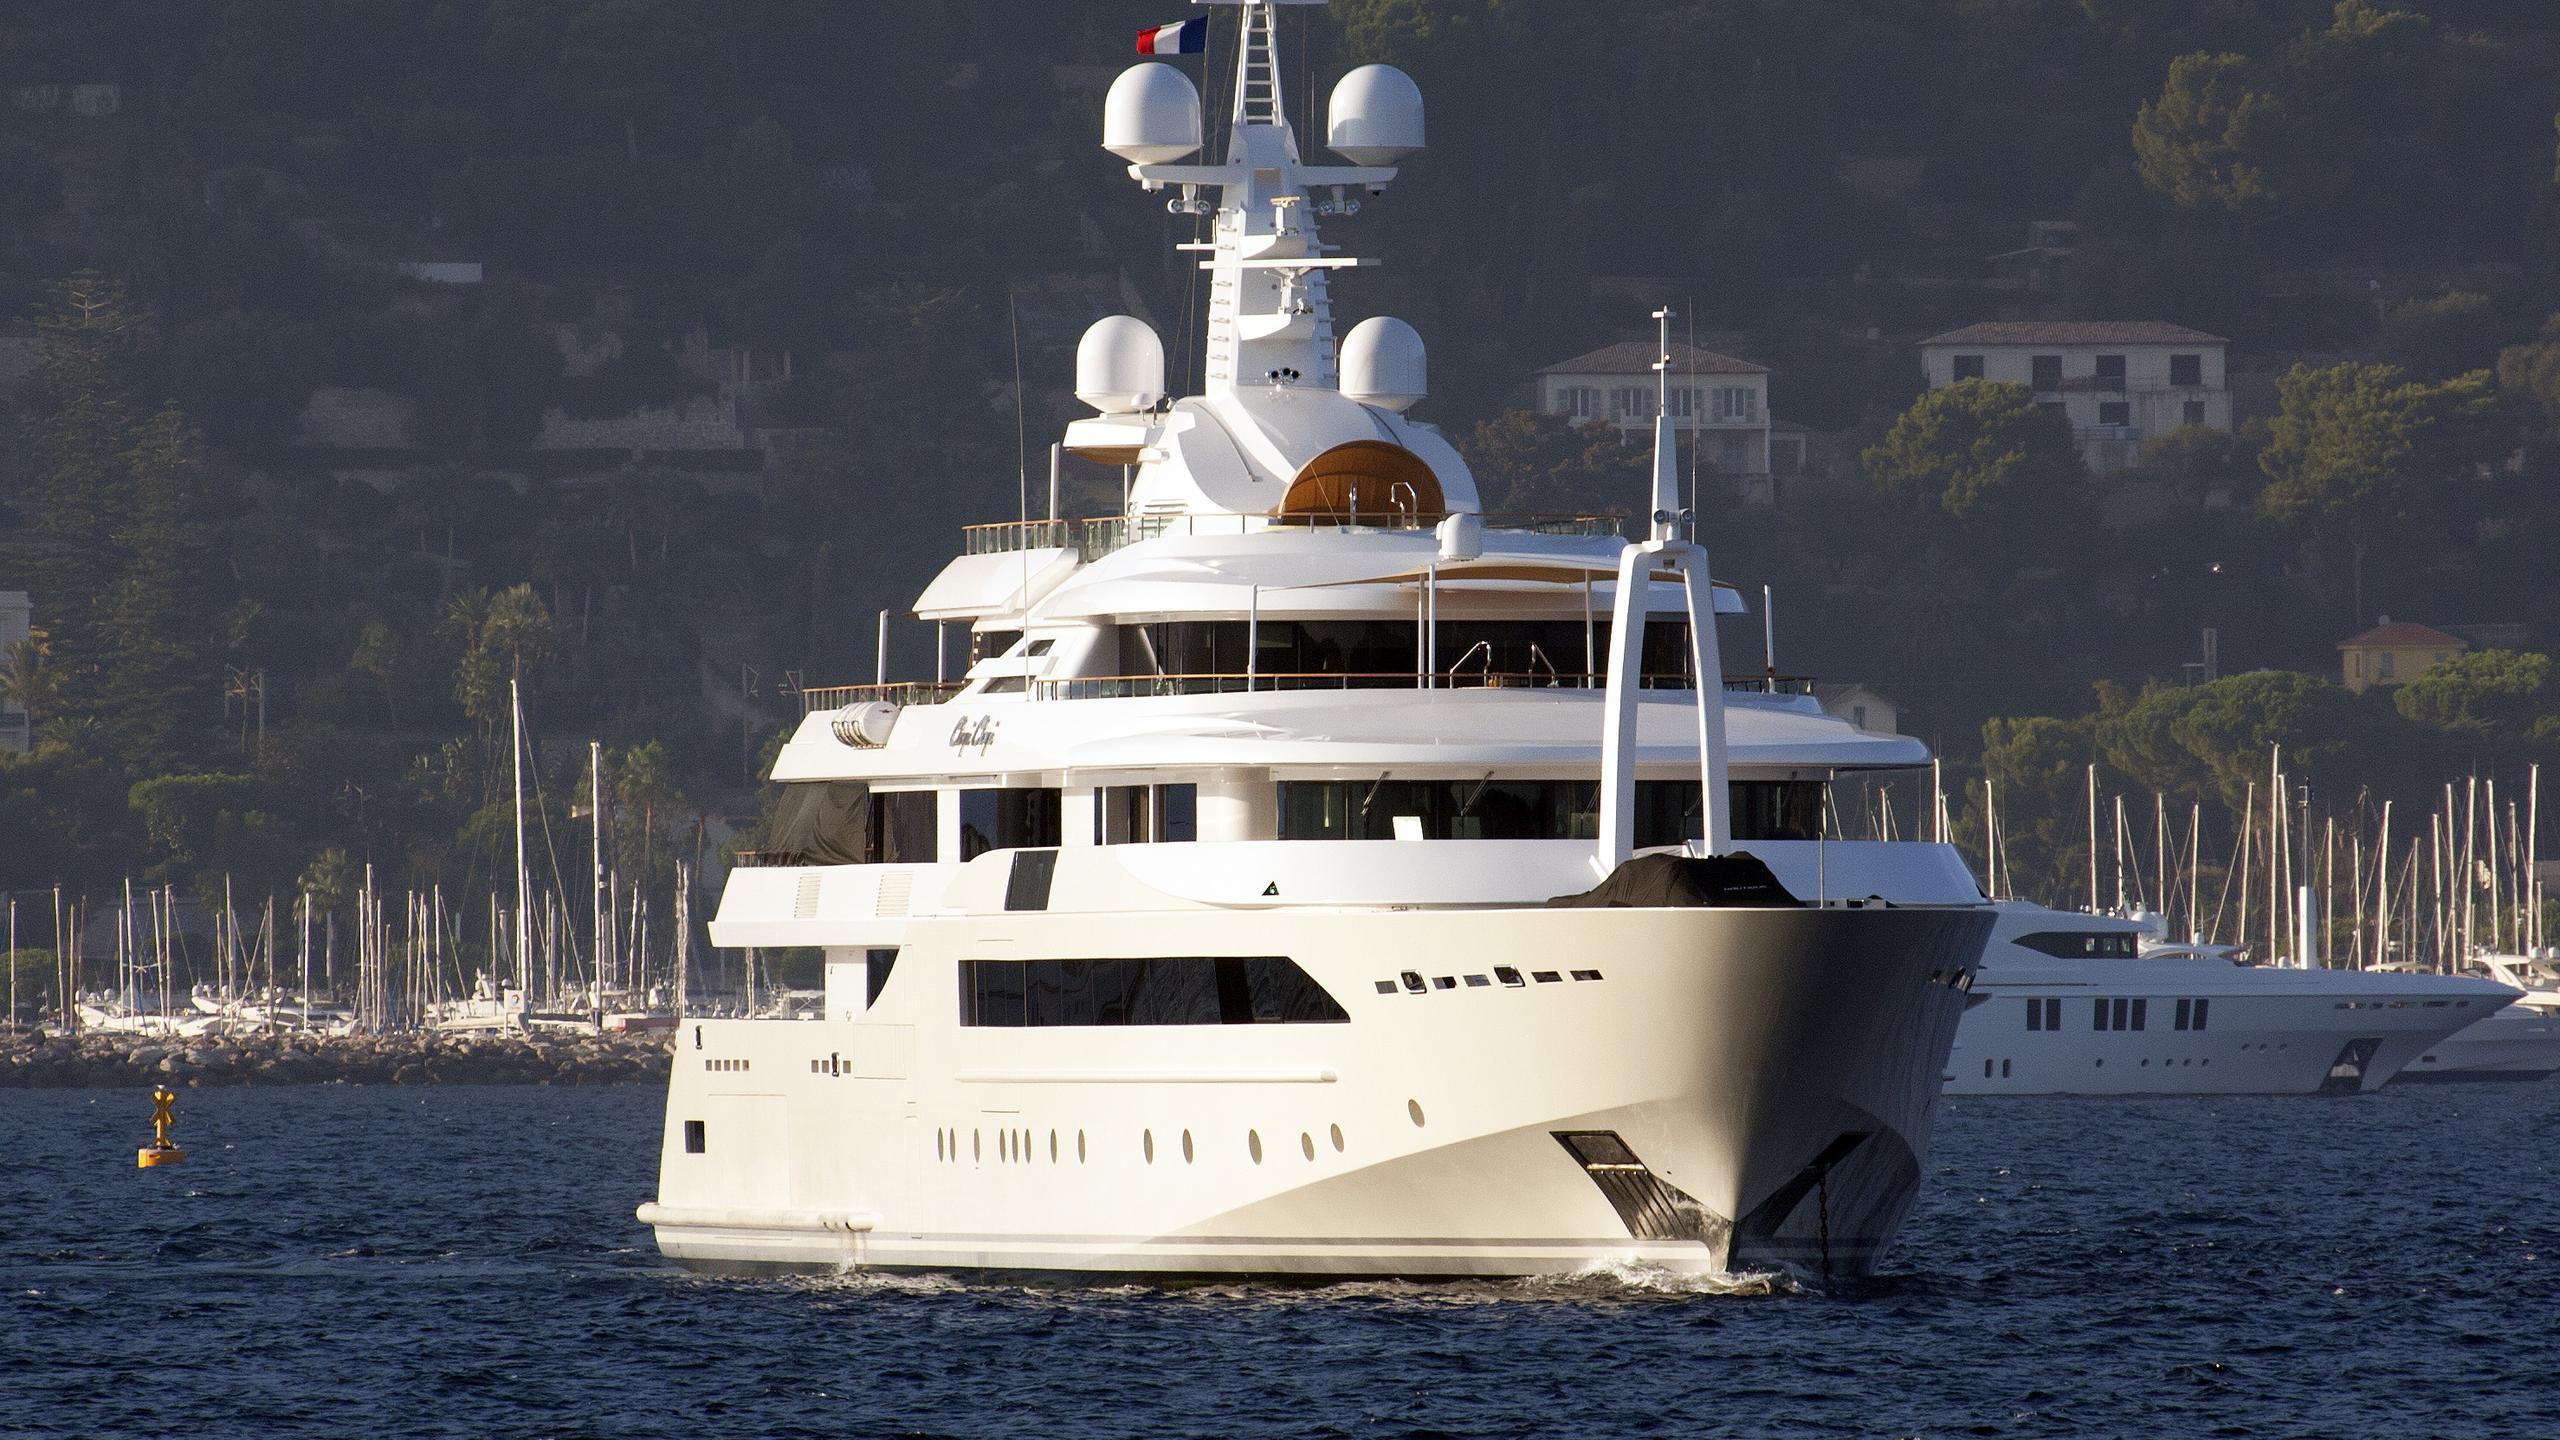 chopi-chopi-motor-yacht-crn-2013-80m-front-profile